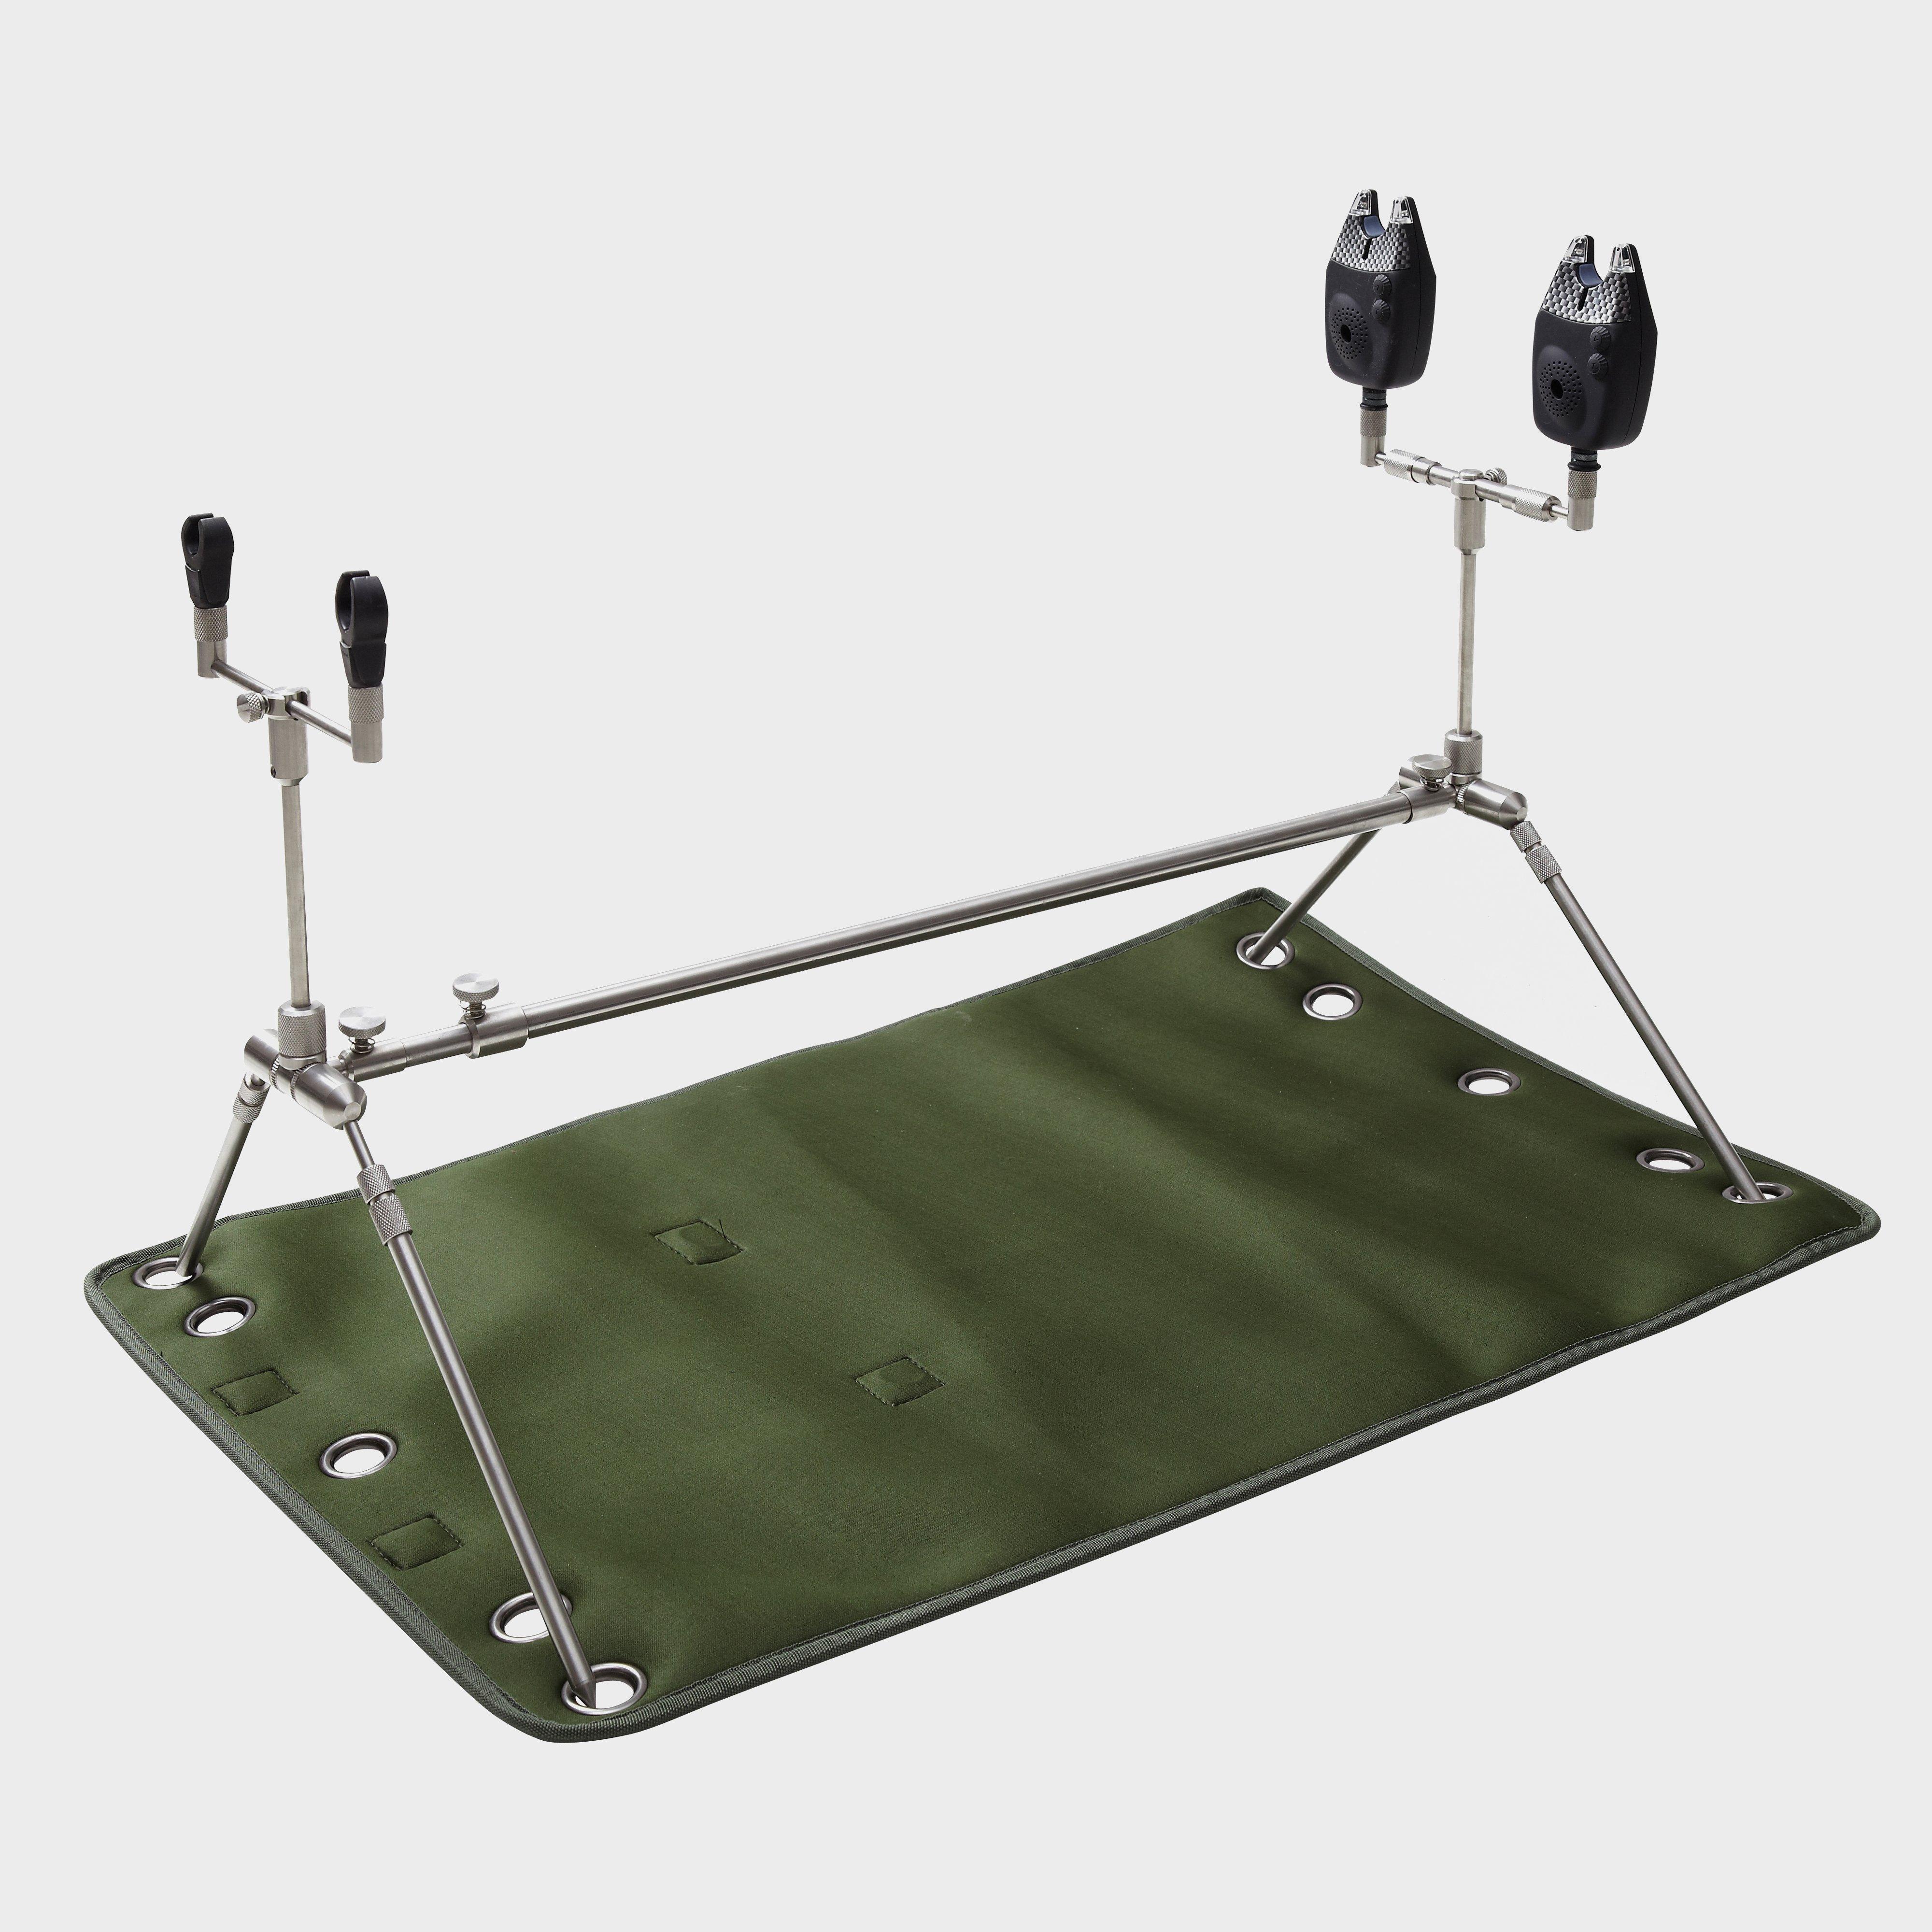 Westlake Splash Mat With Pegs - Green/Pegs, Green